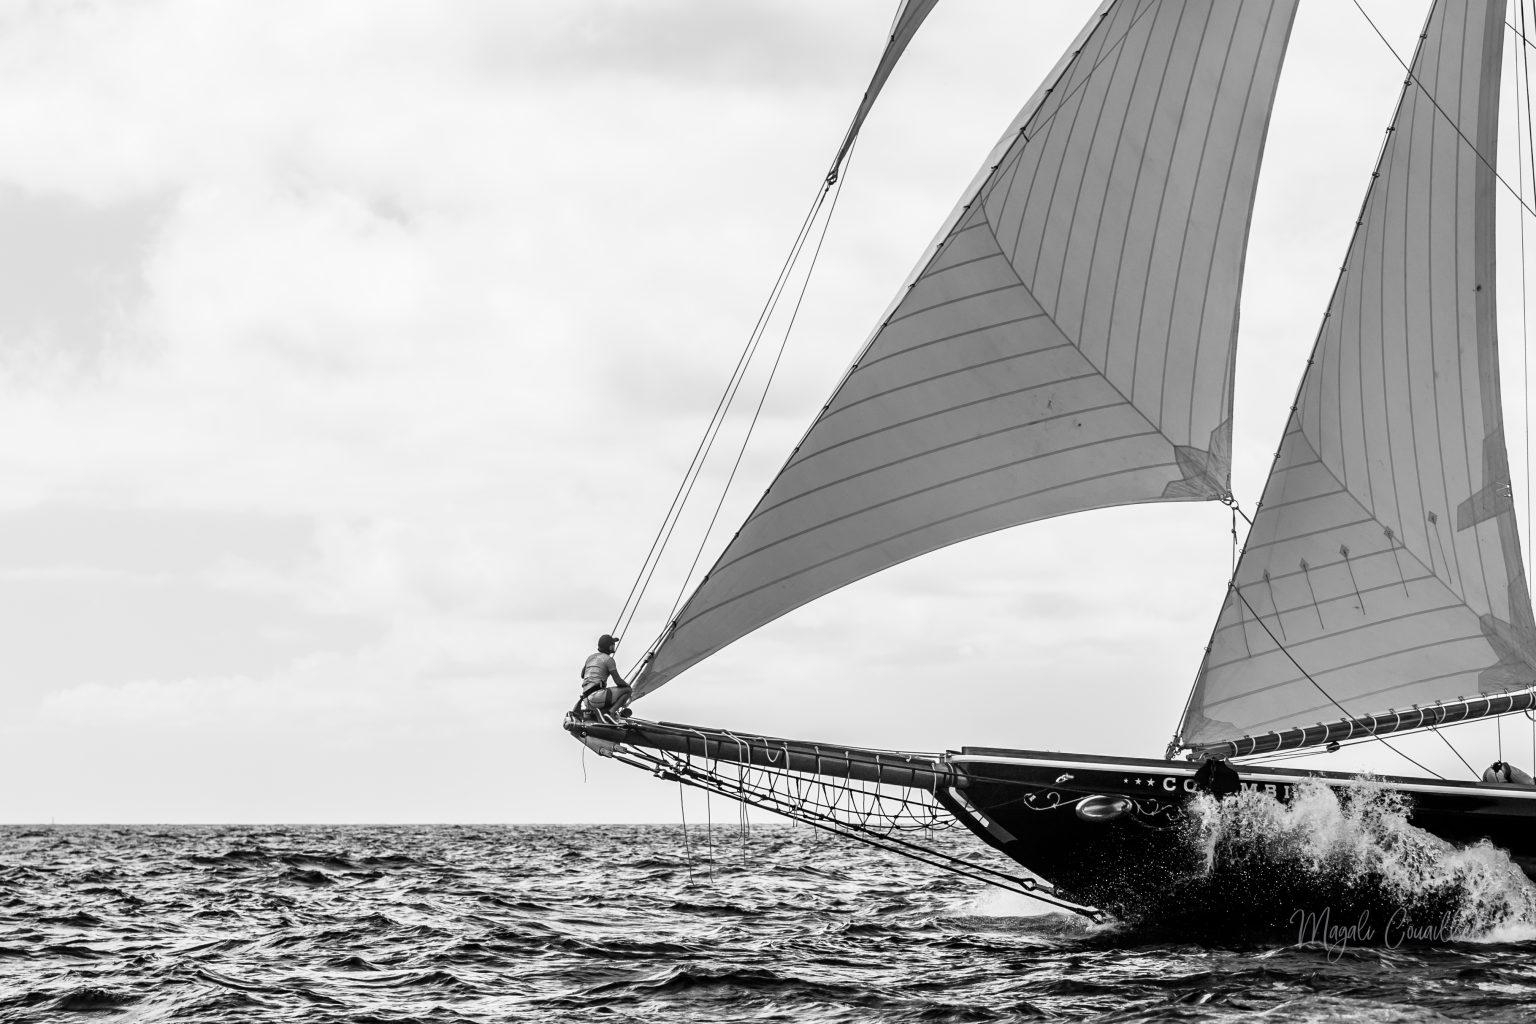 Columbia yacht, Bucket Regatta 2019 St Barths-3